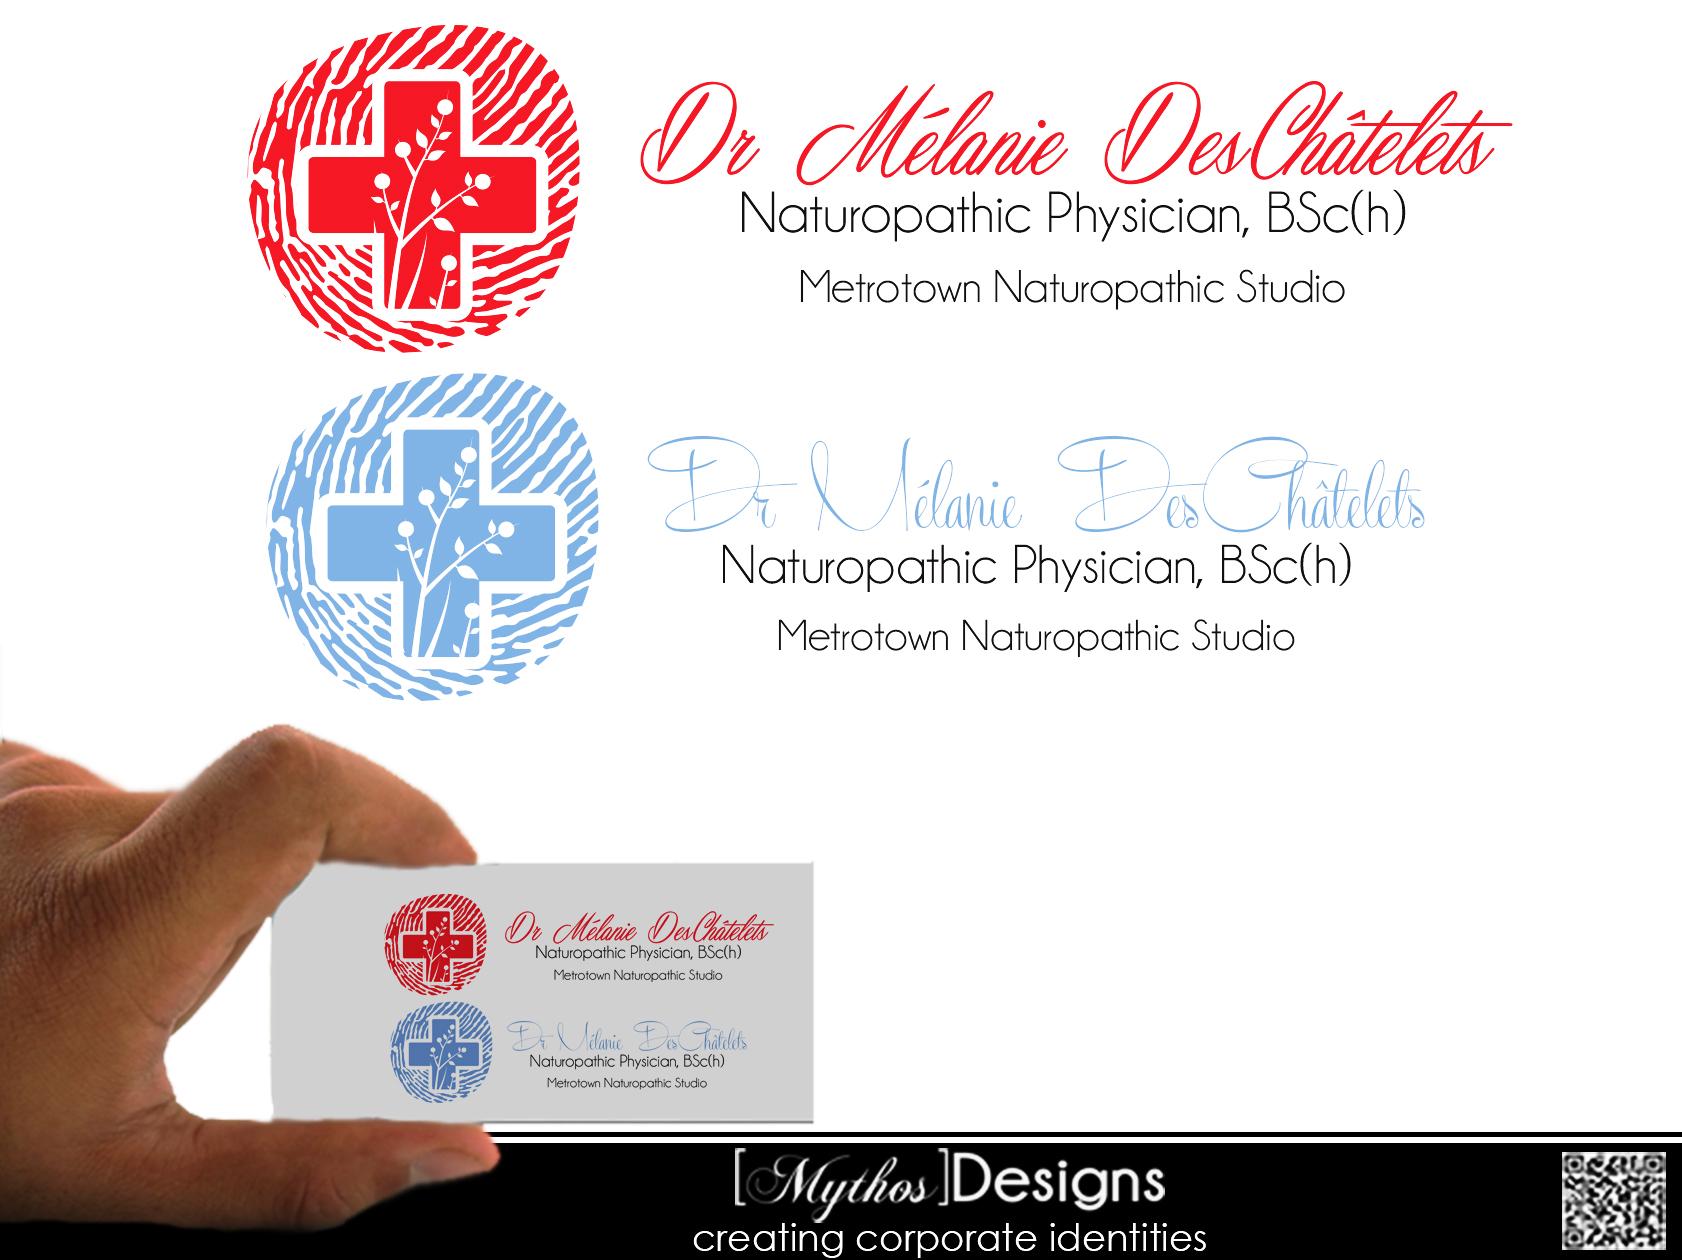 Logo Design by Mythos Designs - Entry No. 175 in the Logo Design Contest Artistic Logo Design for Dr Mélanie DesChâtelets.